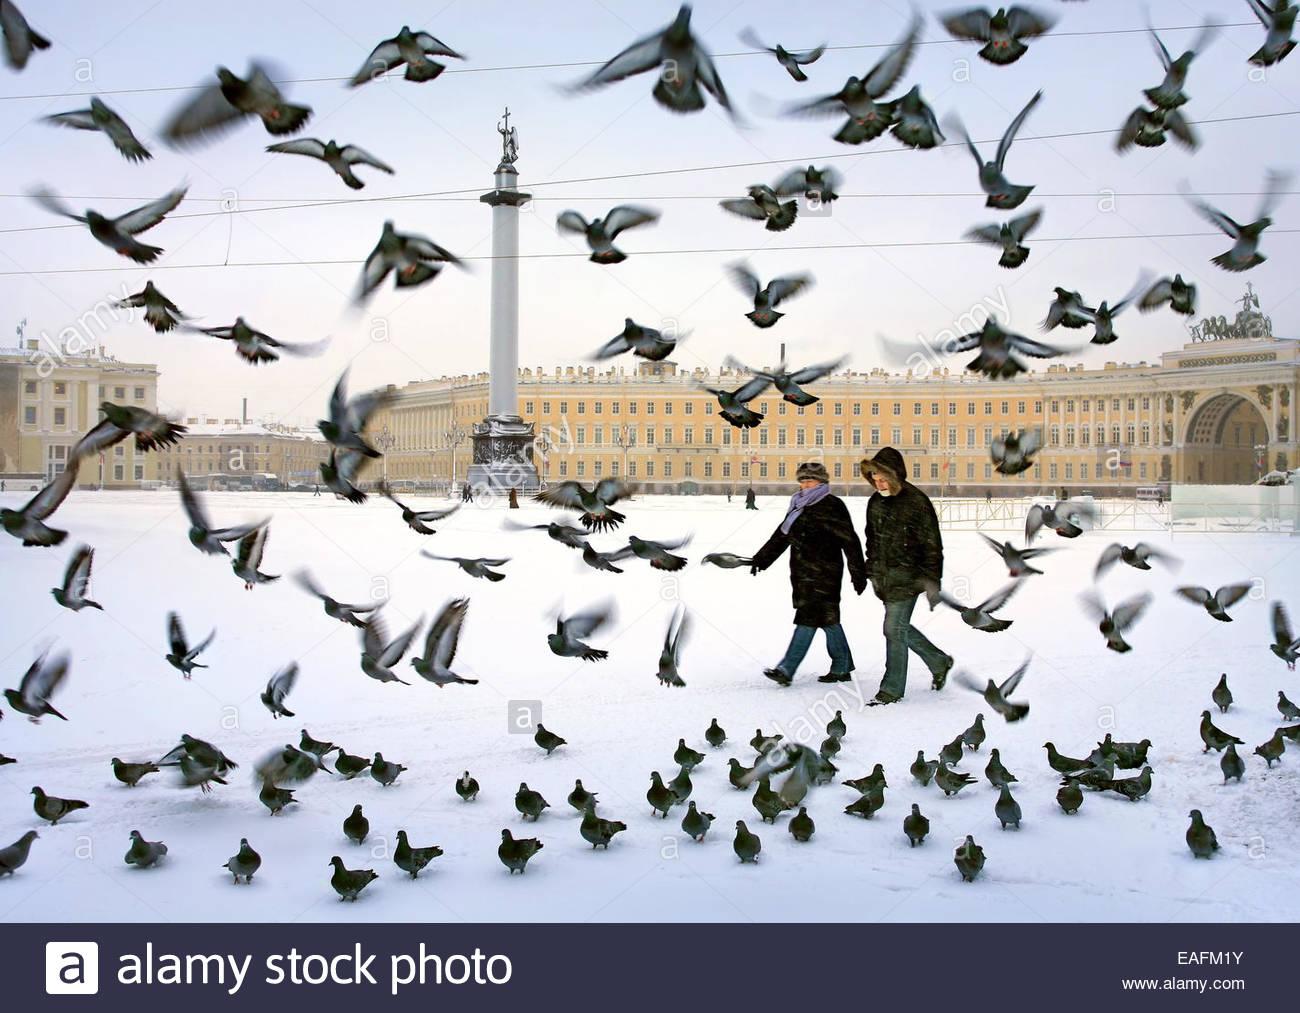 Vögel auf dem Schlossplatz, Alexander-Säule. Sankt-Petersburg, Russland. Stockbild